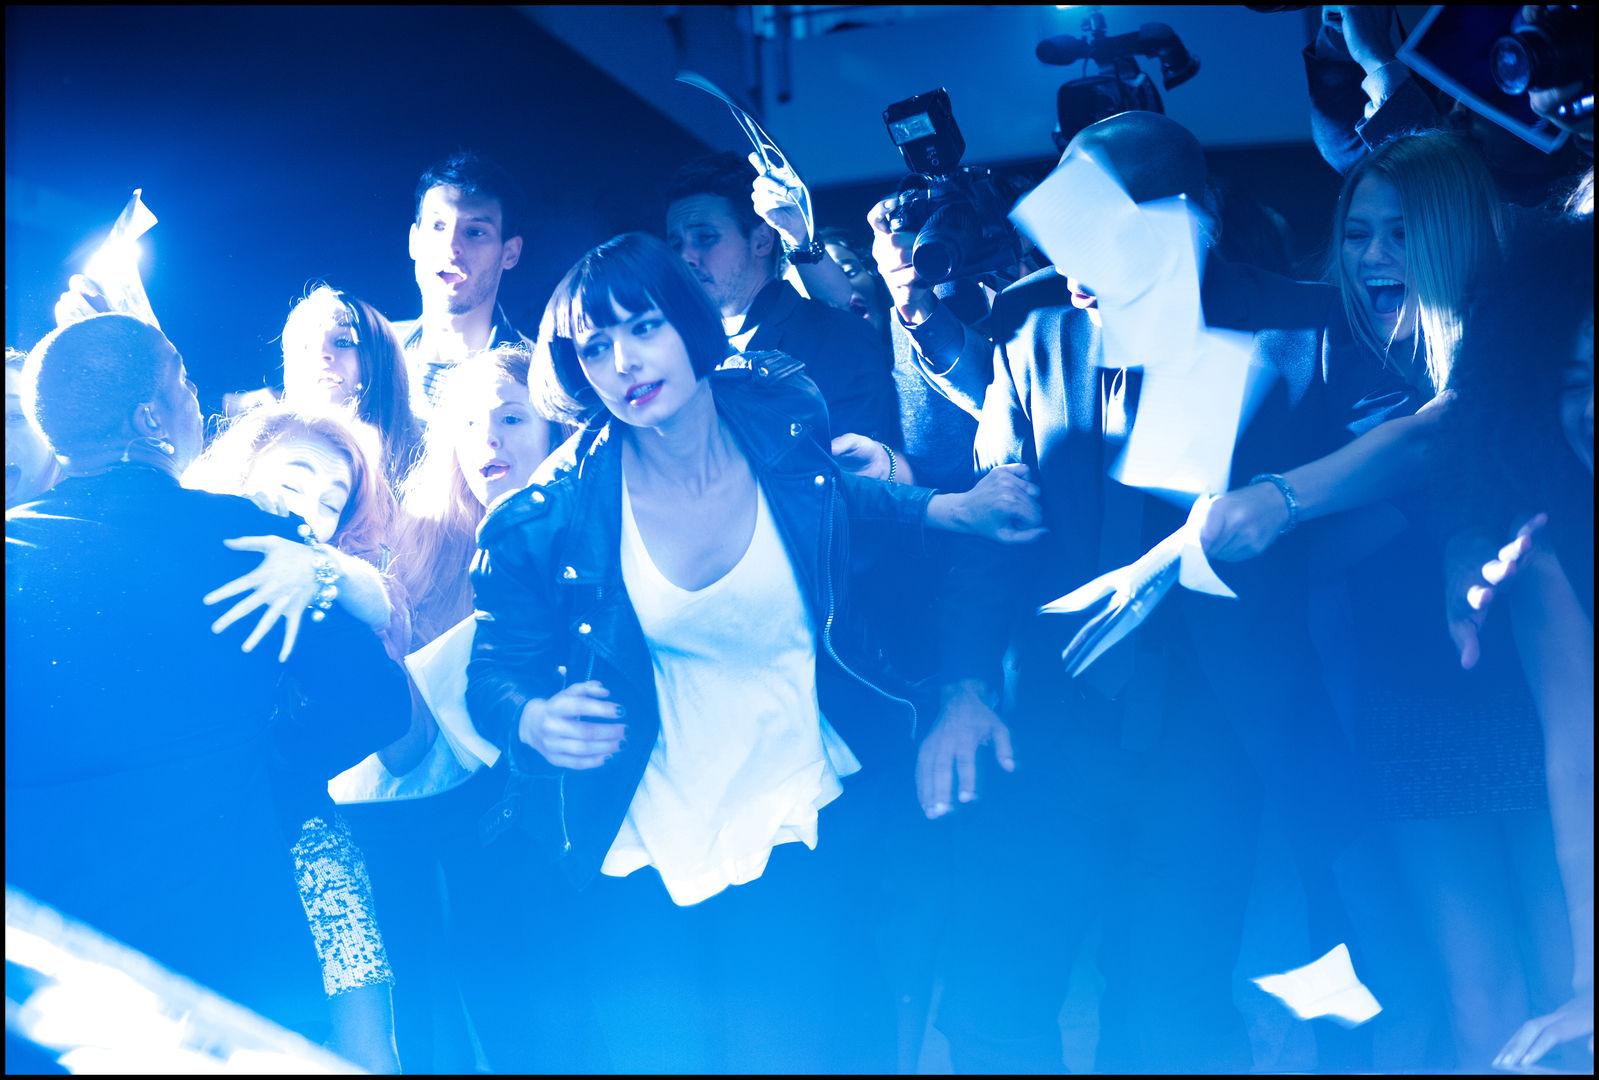 Chanel, Bleu de Chanel,  Gaspard Ulliel, James Gray, Photograph by Andrew Cooper